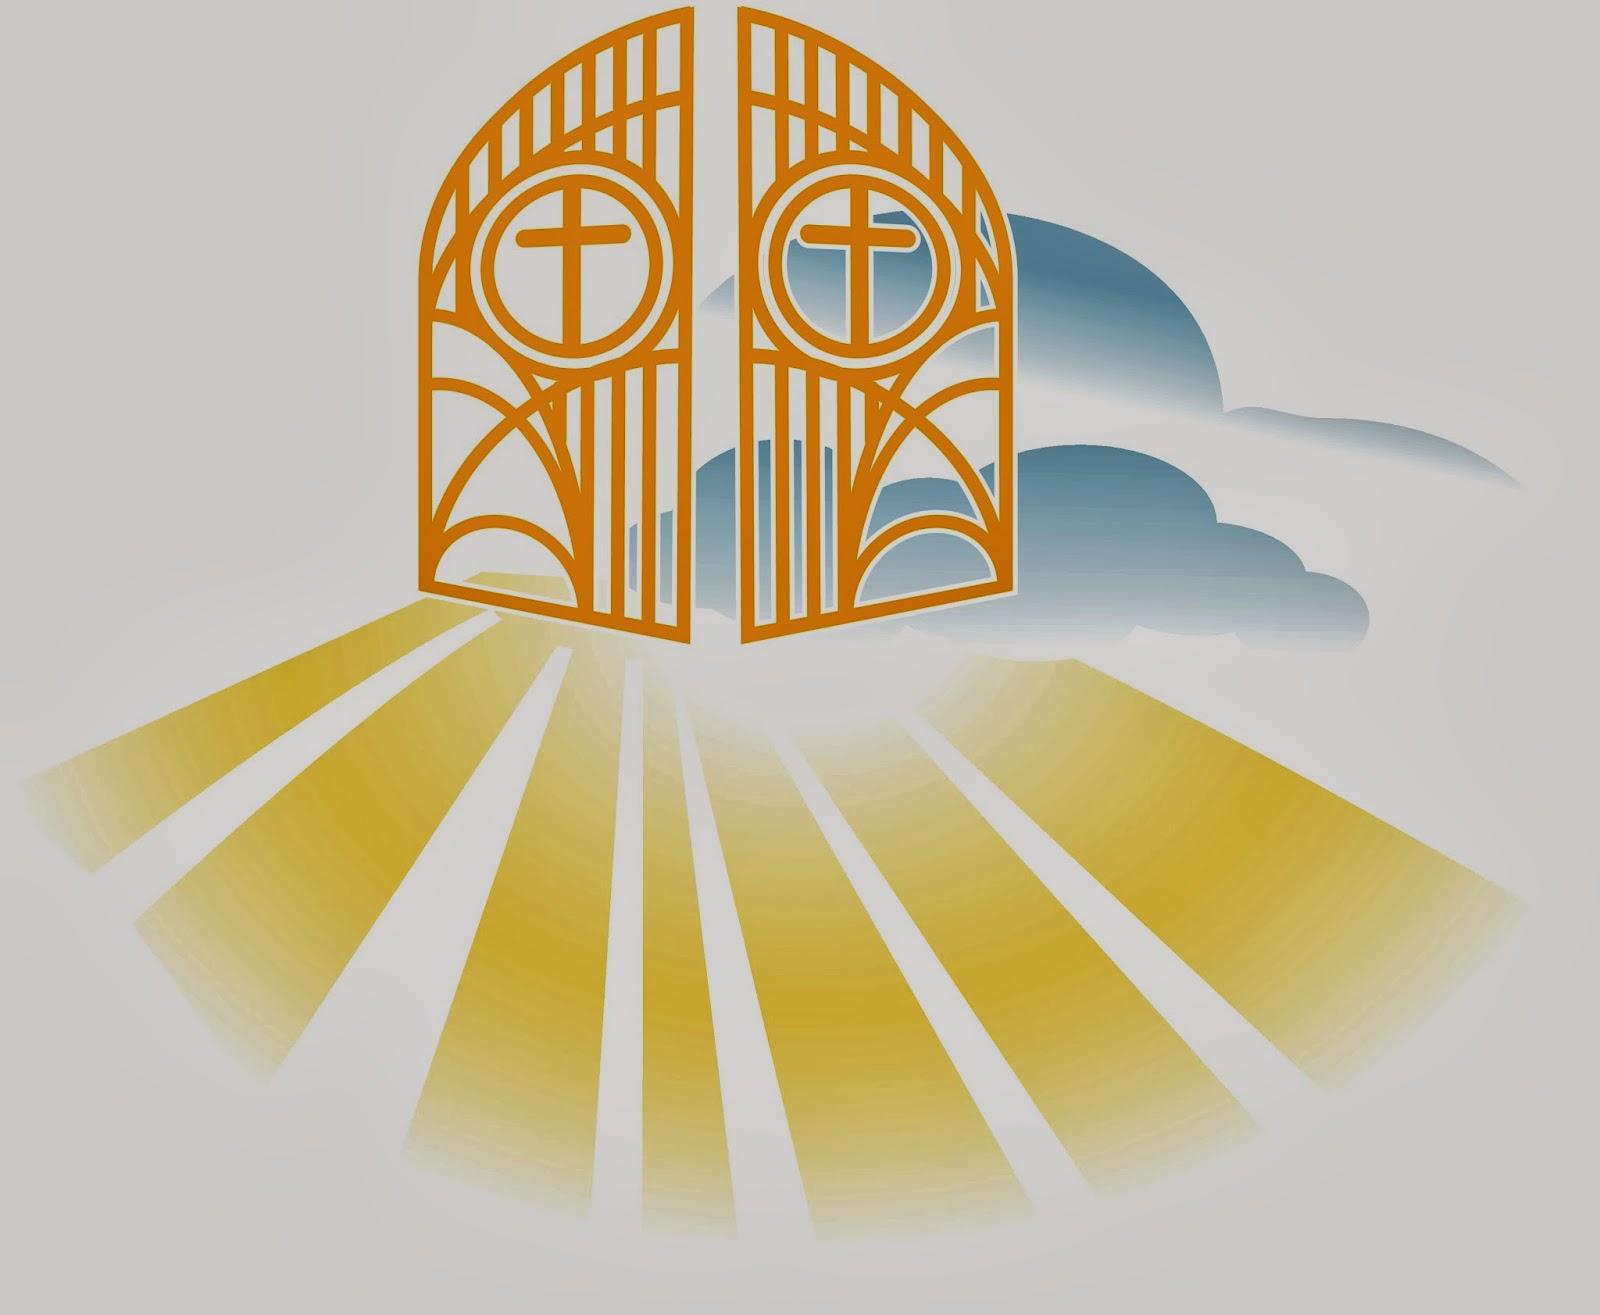 Heaven gates clipart.